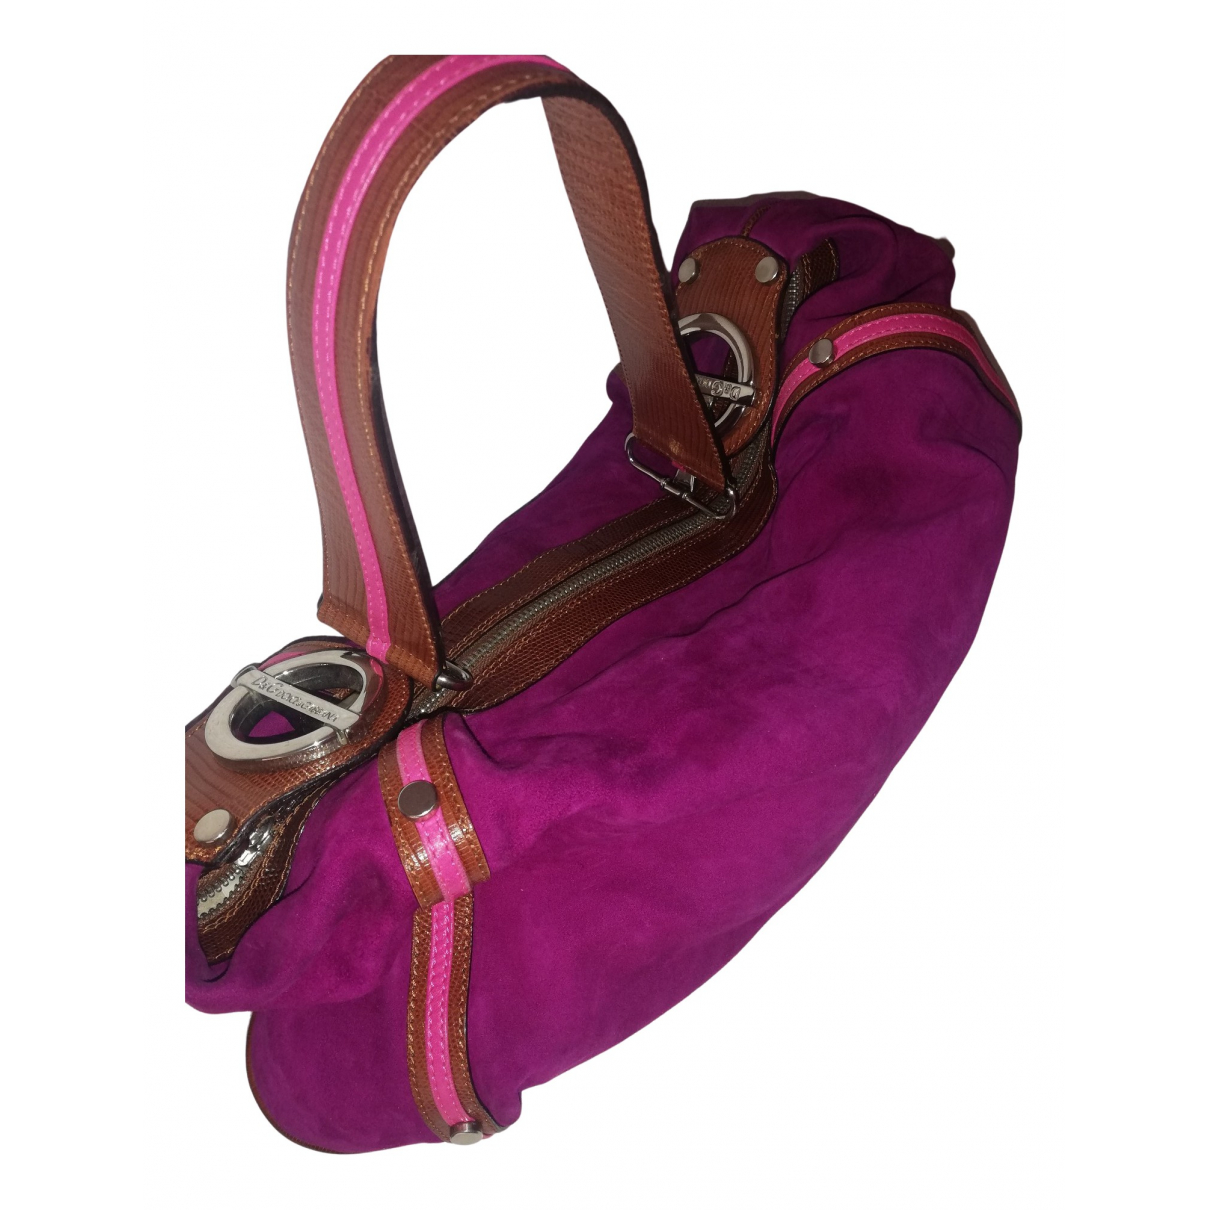 D&g \N Handtasche in  Bordeauxrot Fell